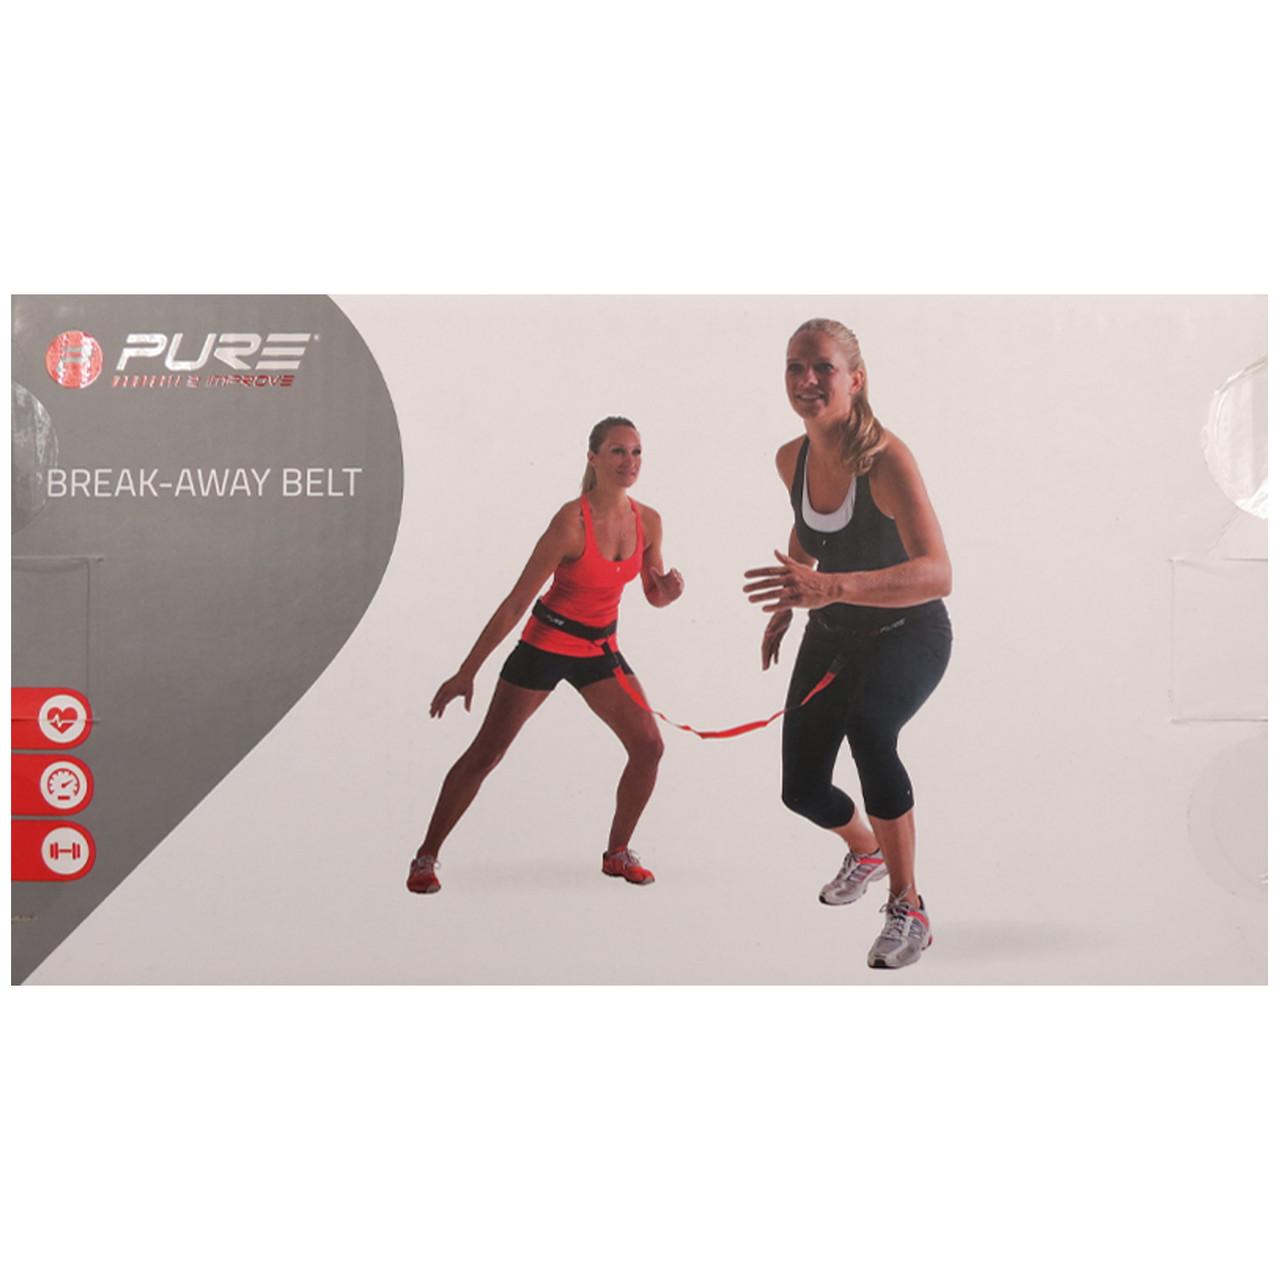 Набор ремней для занятий спортом Pure 233